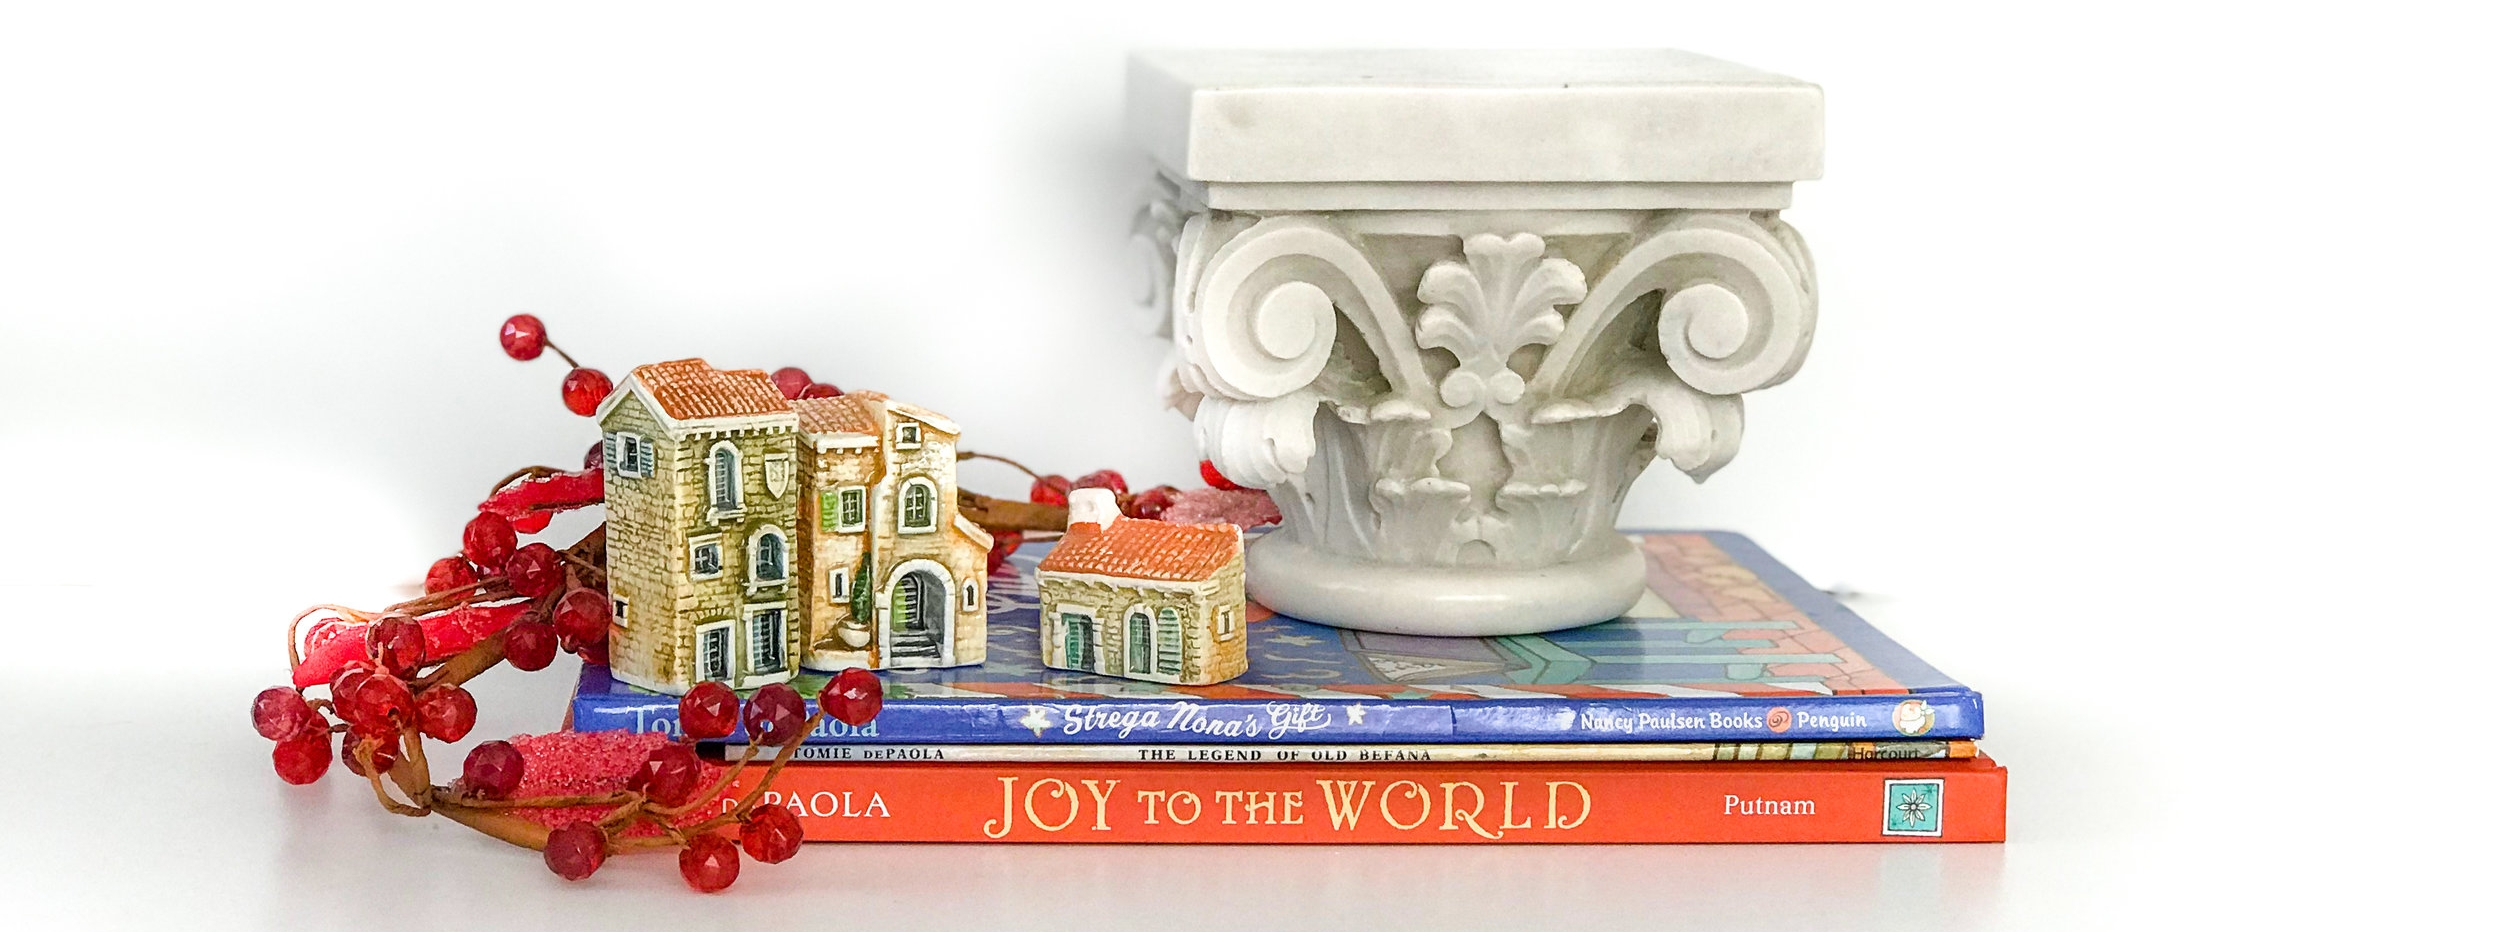 christmas books-6.jpg